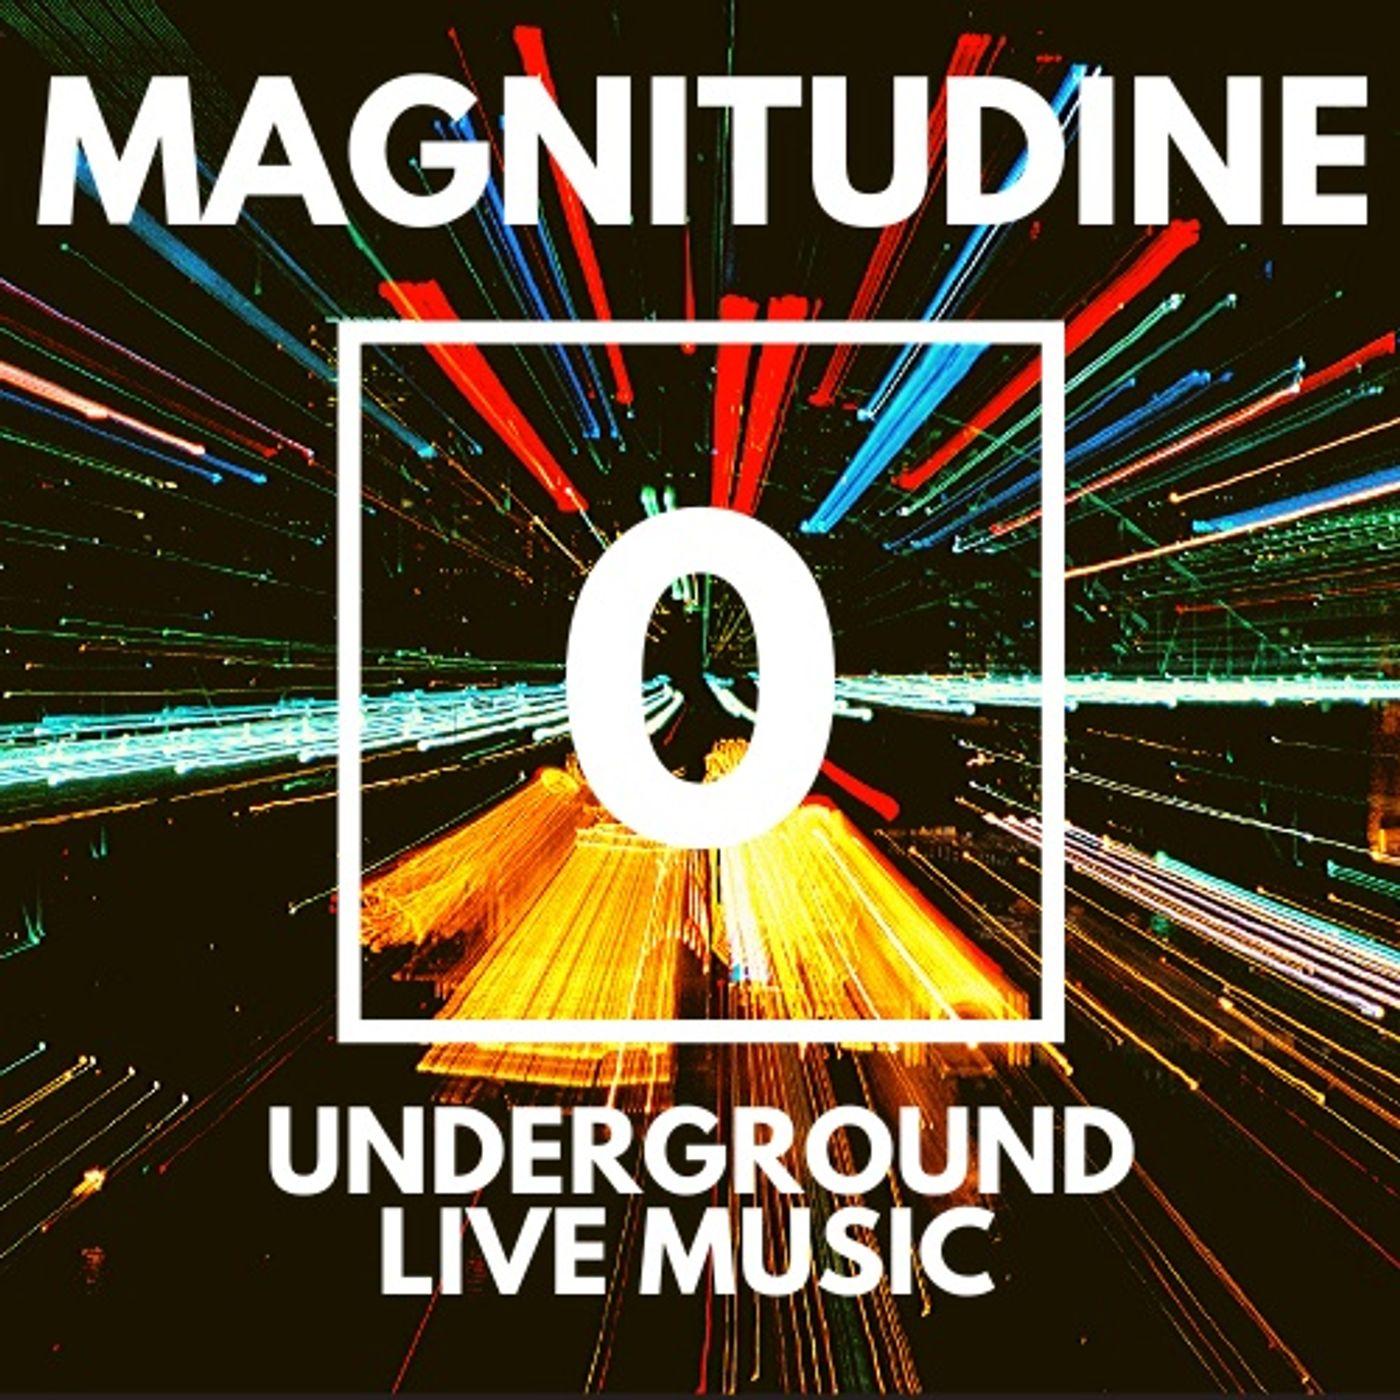 Magnitudine Zero- Underground Live Music